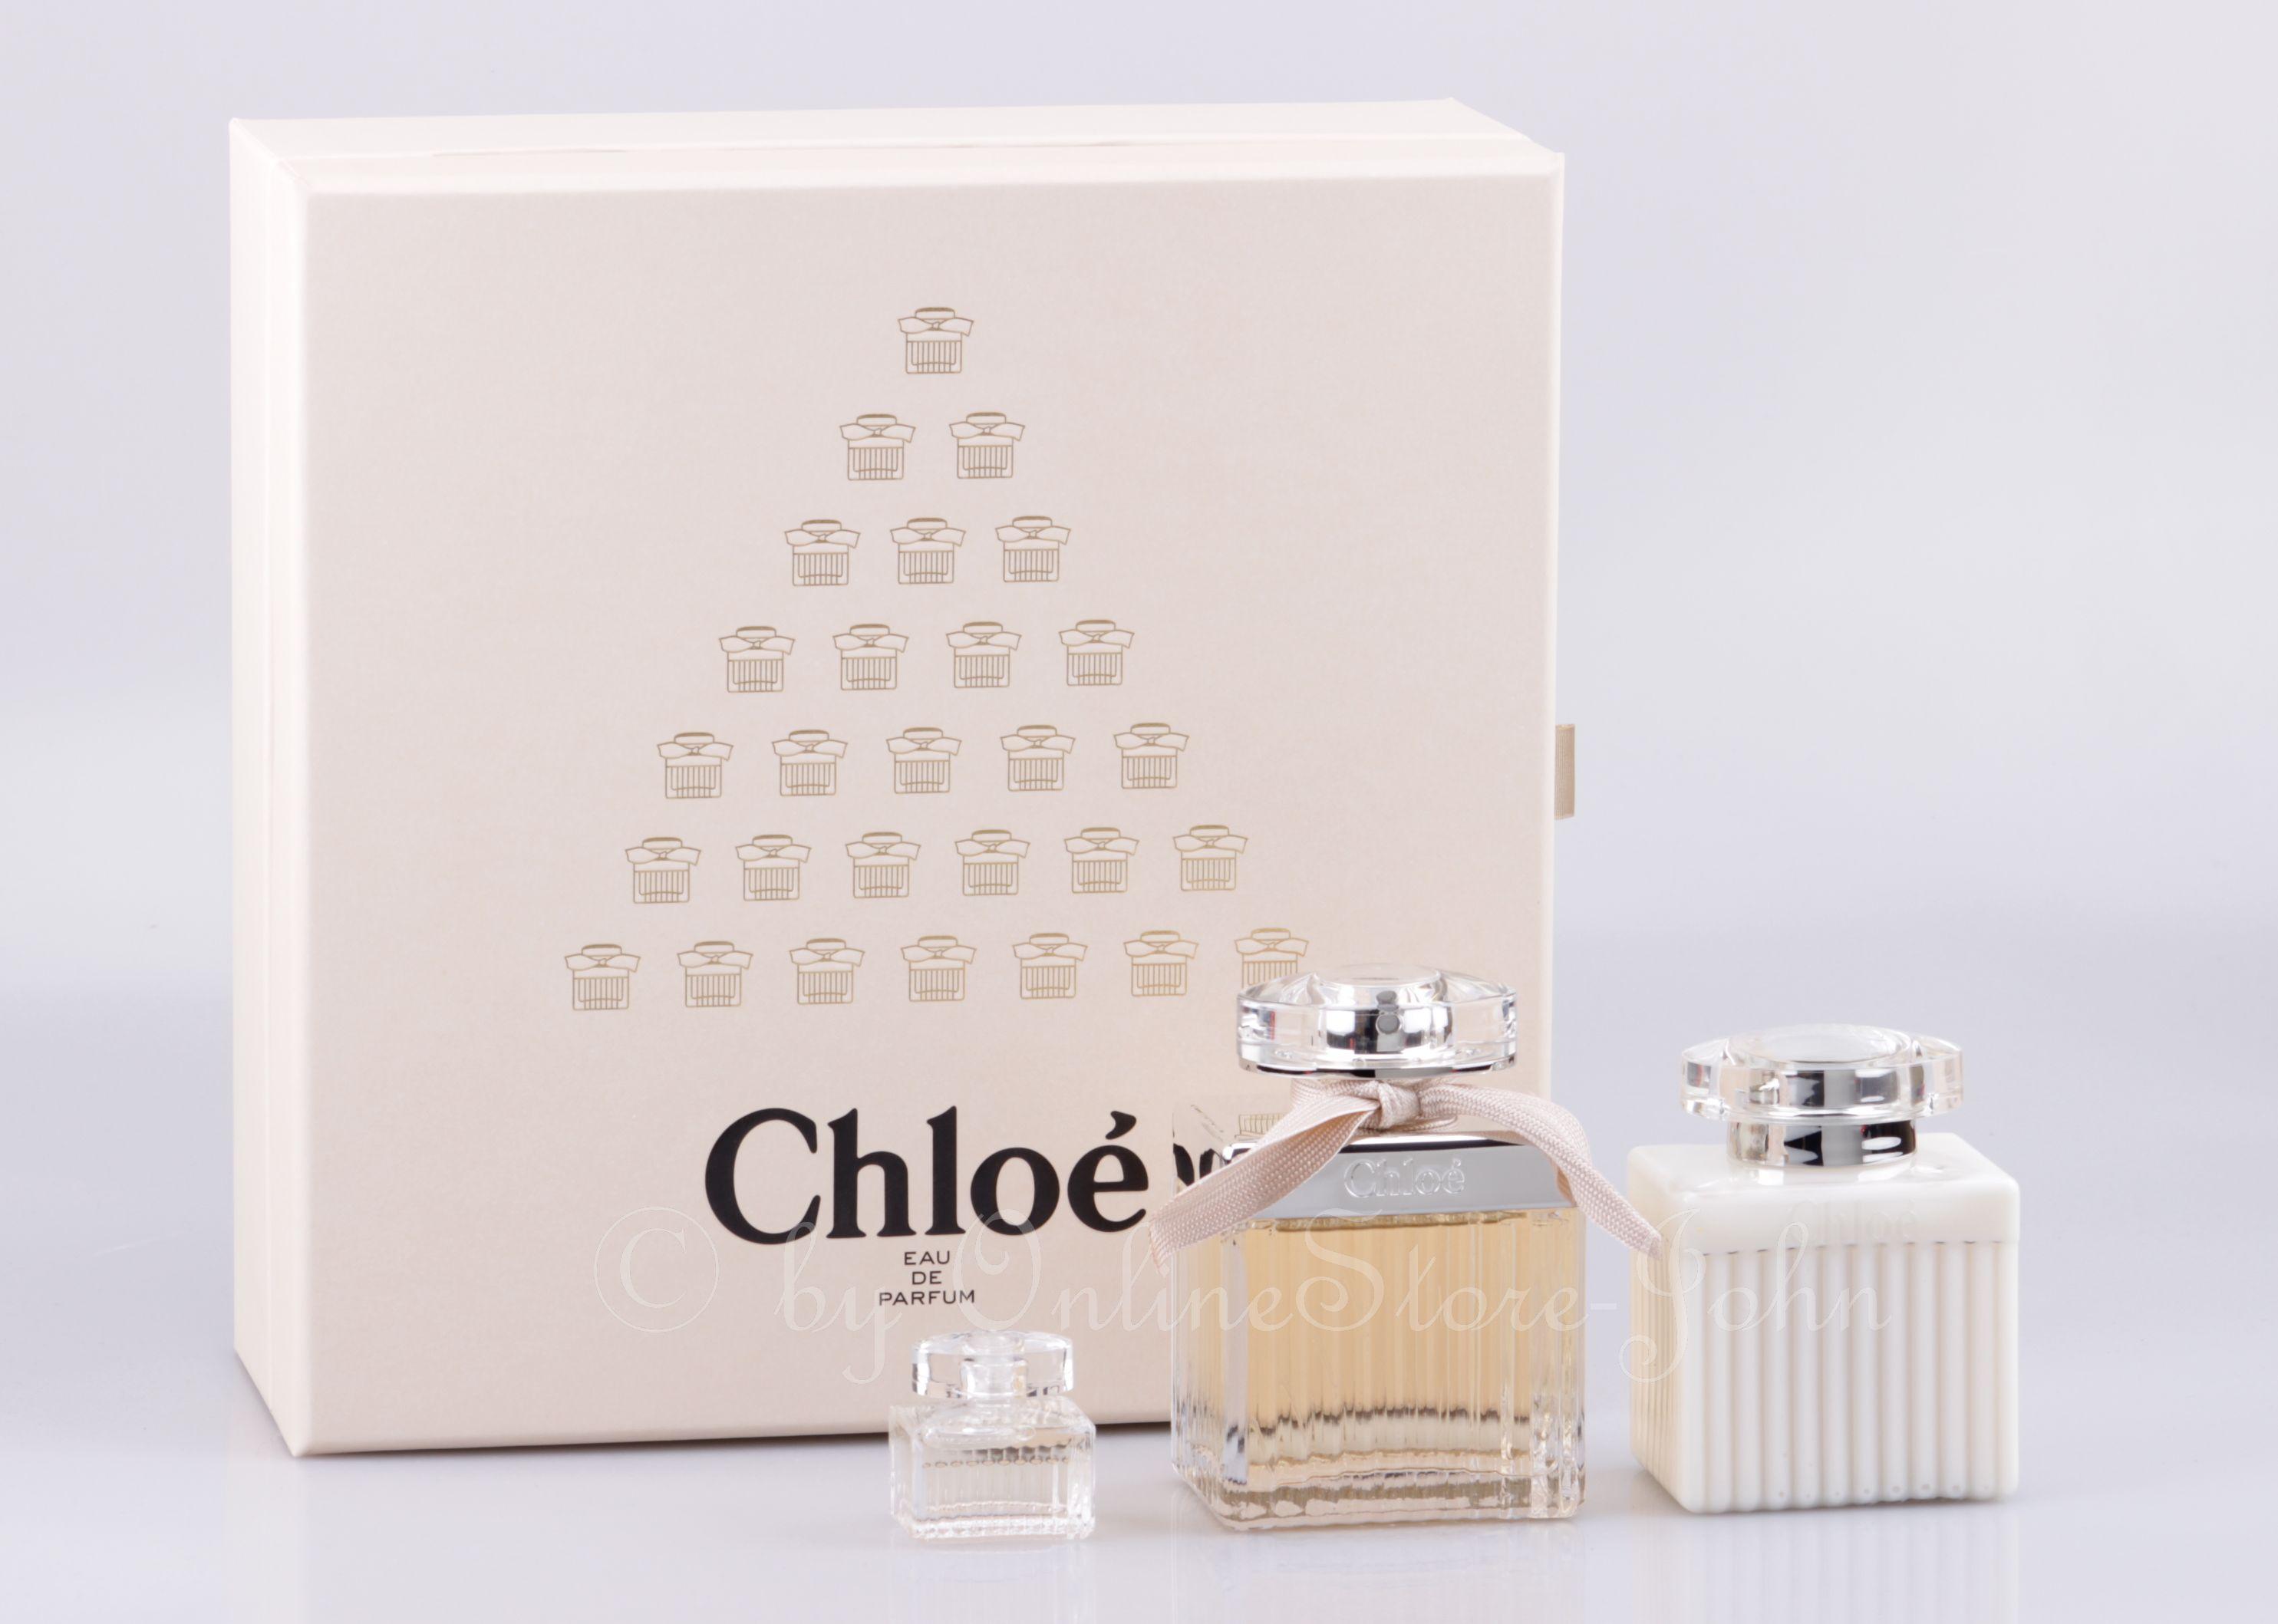 Chloe - Signature Geschenk-Set - 75ml EDP + 5ml EDP + 100ml Bodylotion